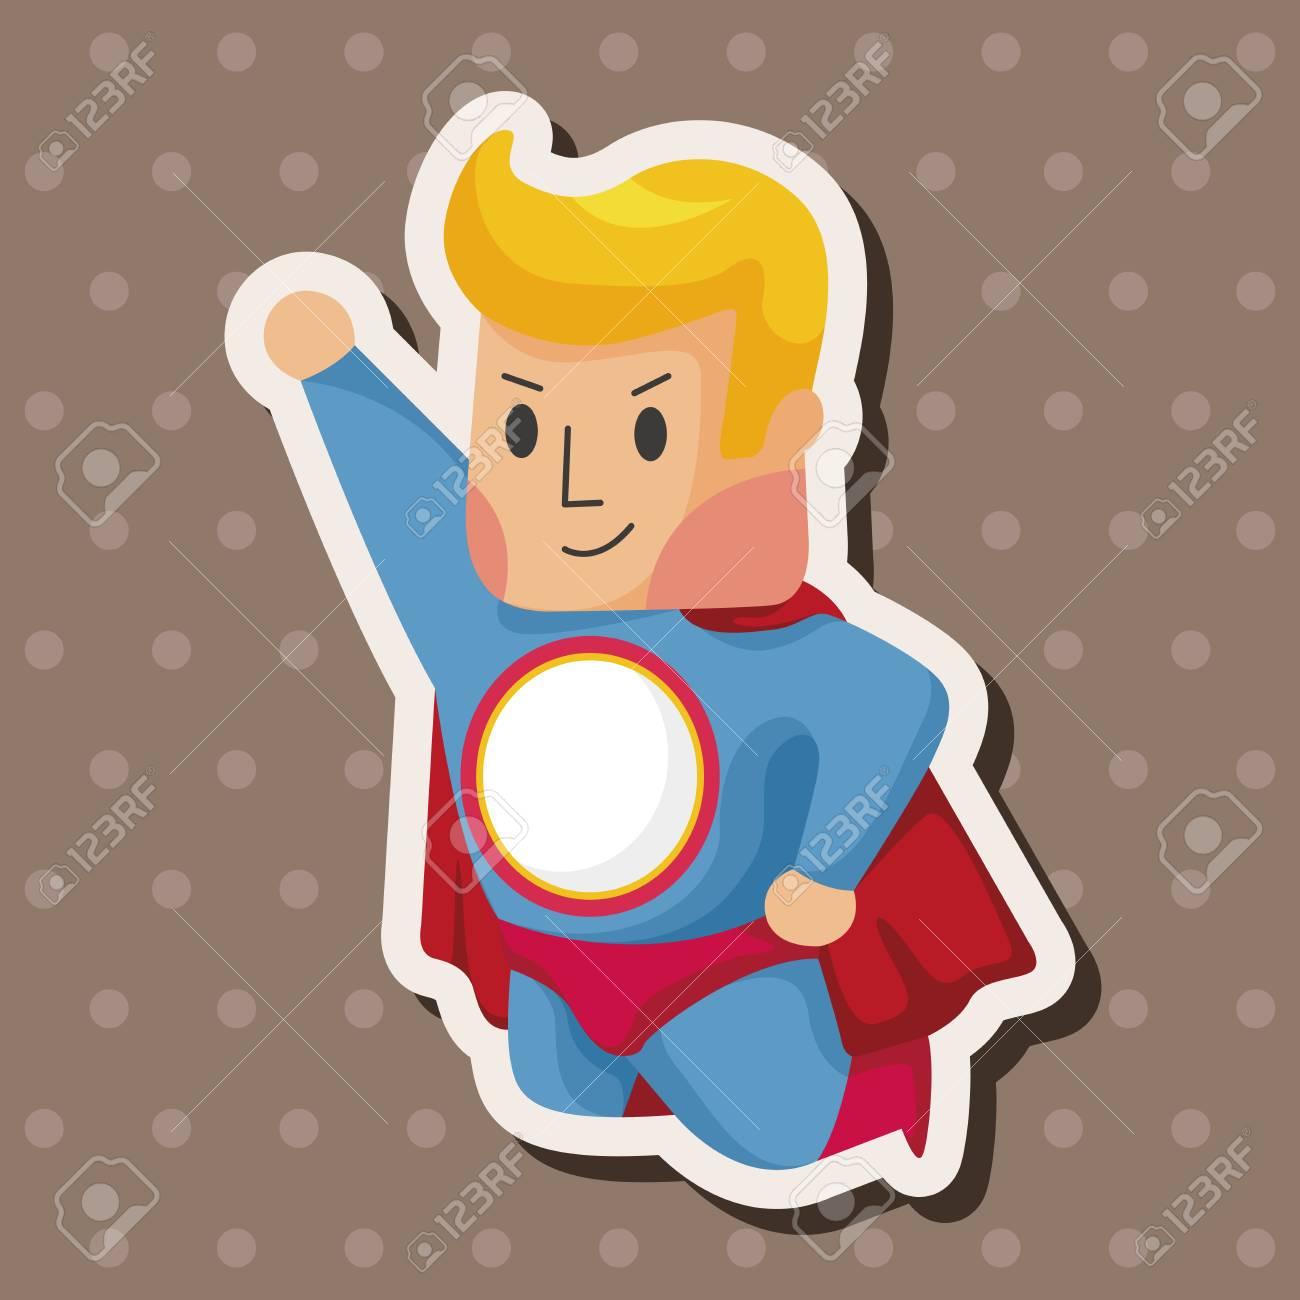 superhero theme elements - 38477574